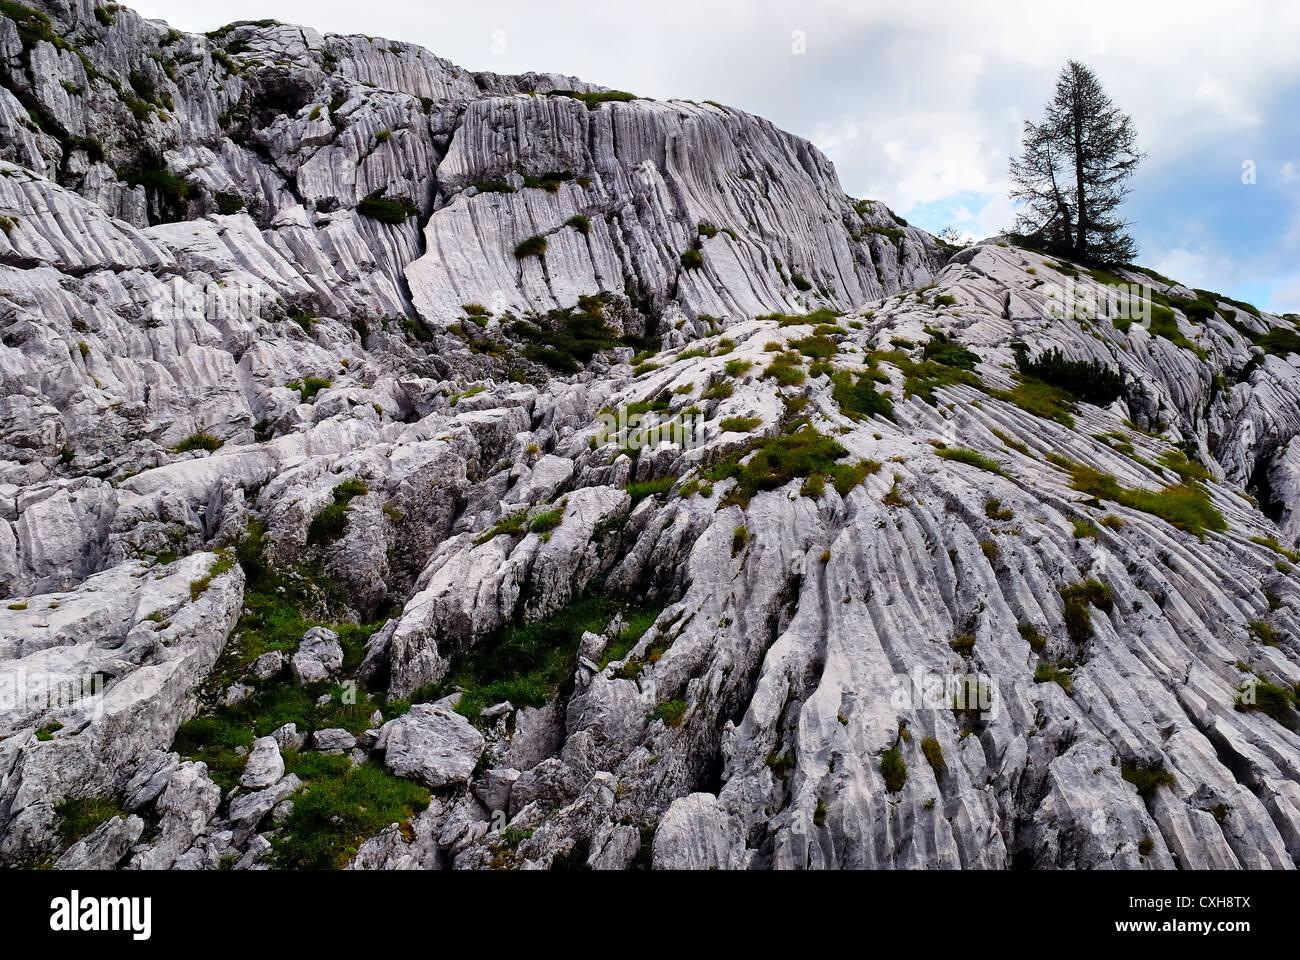 Slovenia, Triglav National Park : karst phenomena caused by the water and ice to Planina na Polju, near Mount Krn. - Stock Image